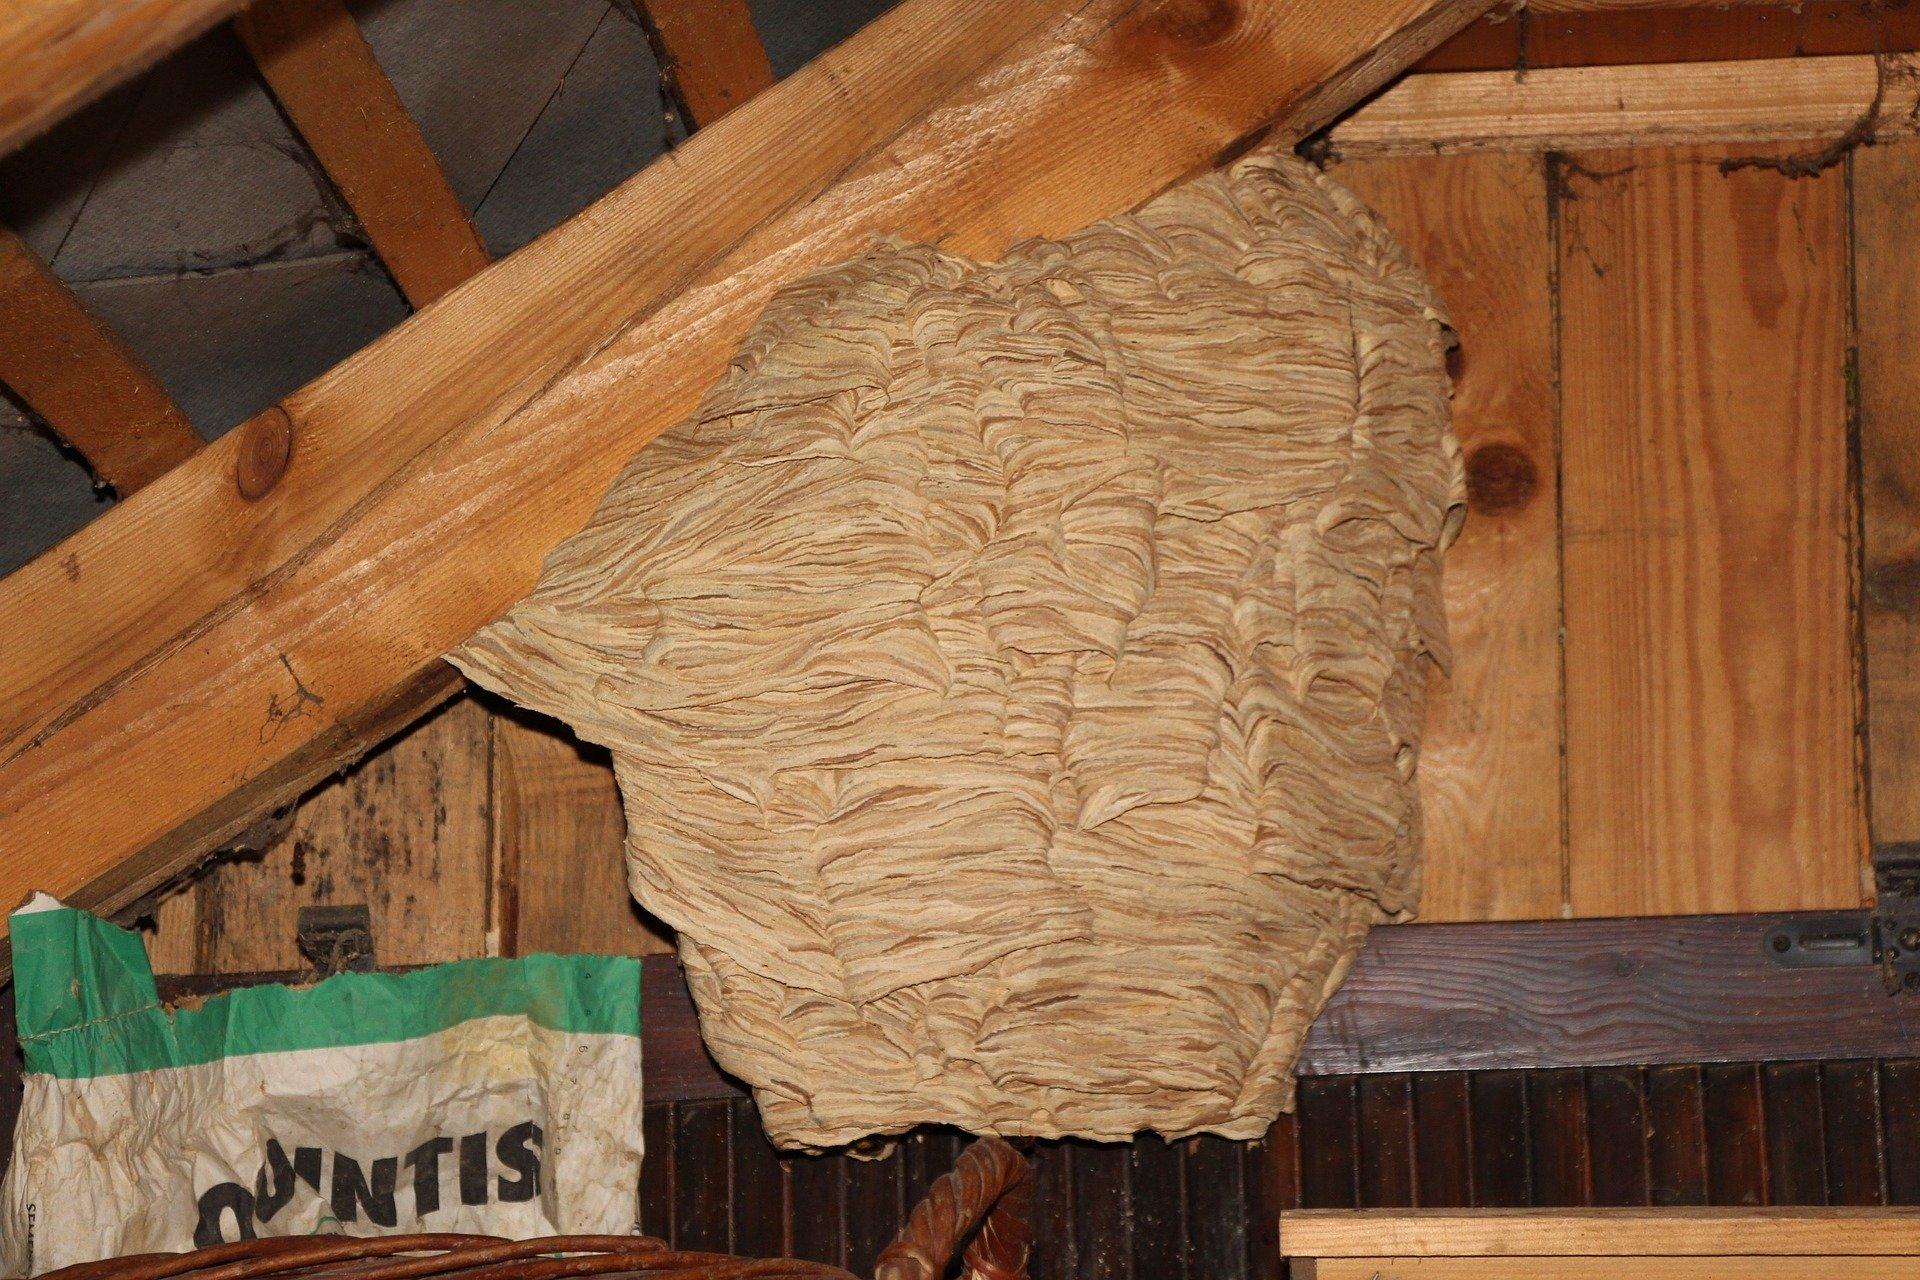 détruire nid de frelons livry gargan